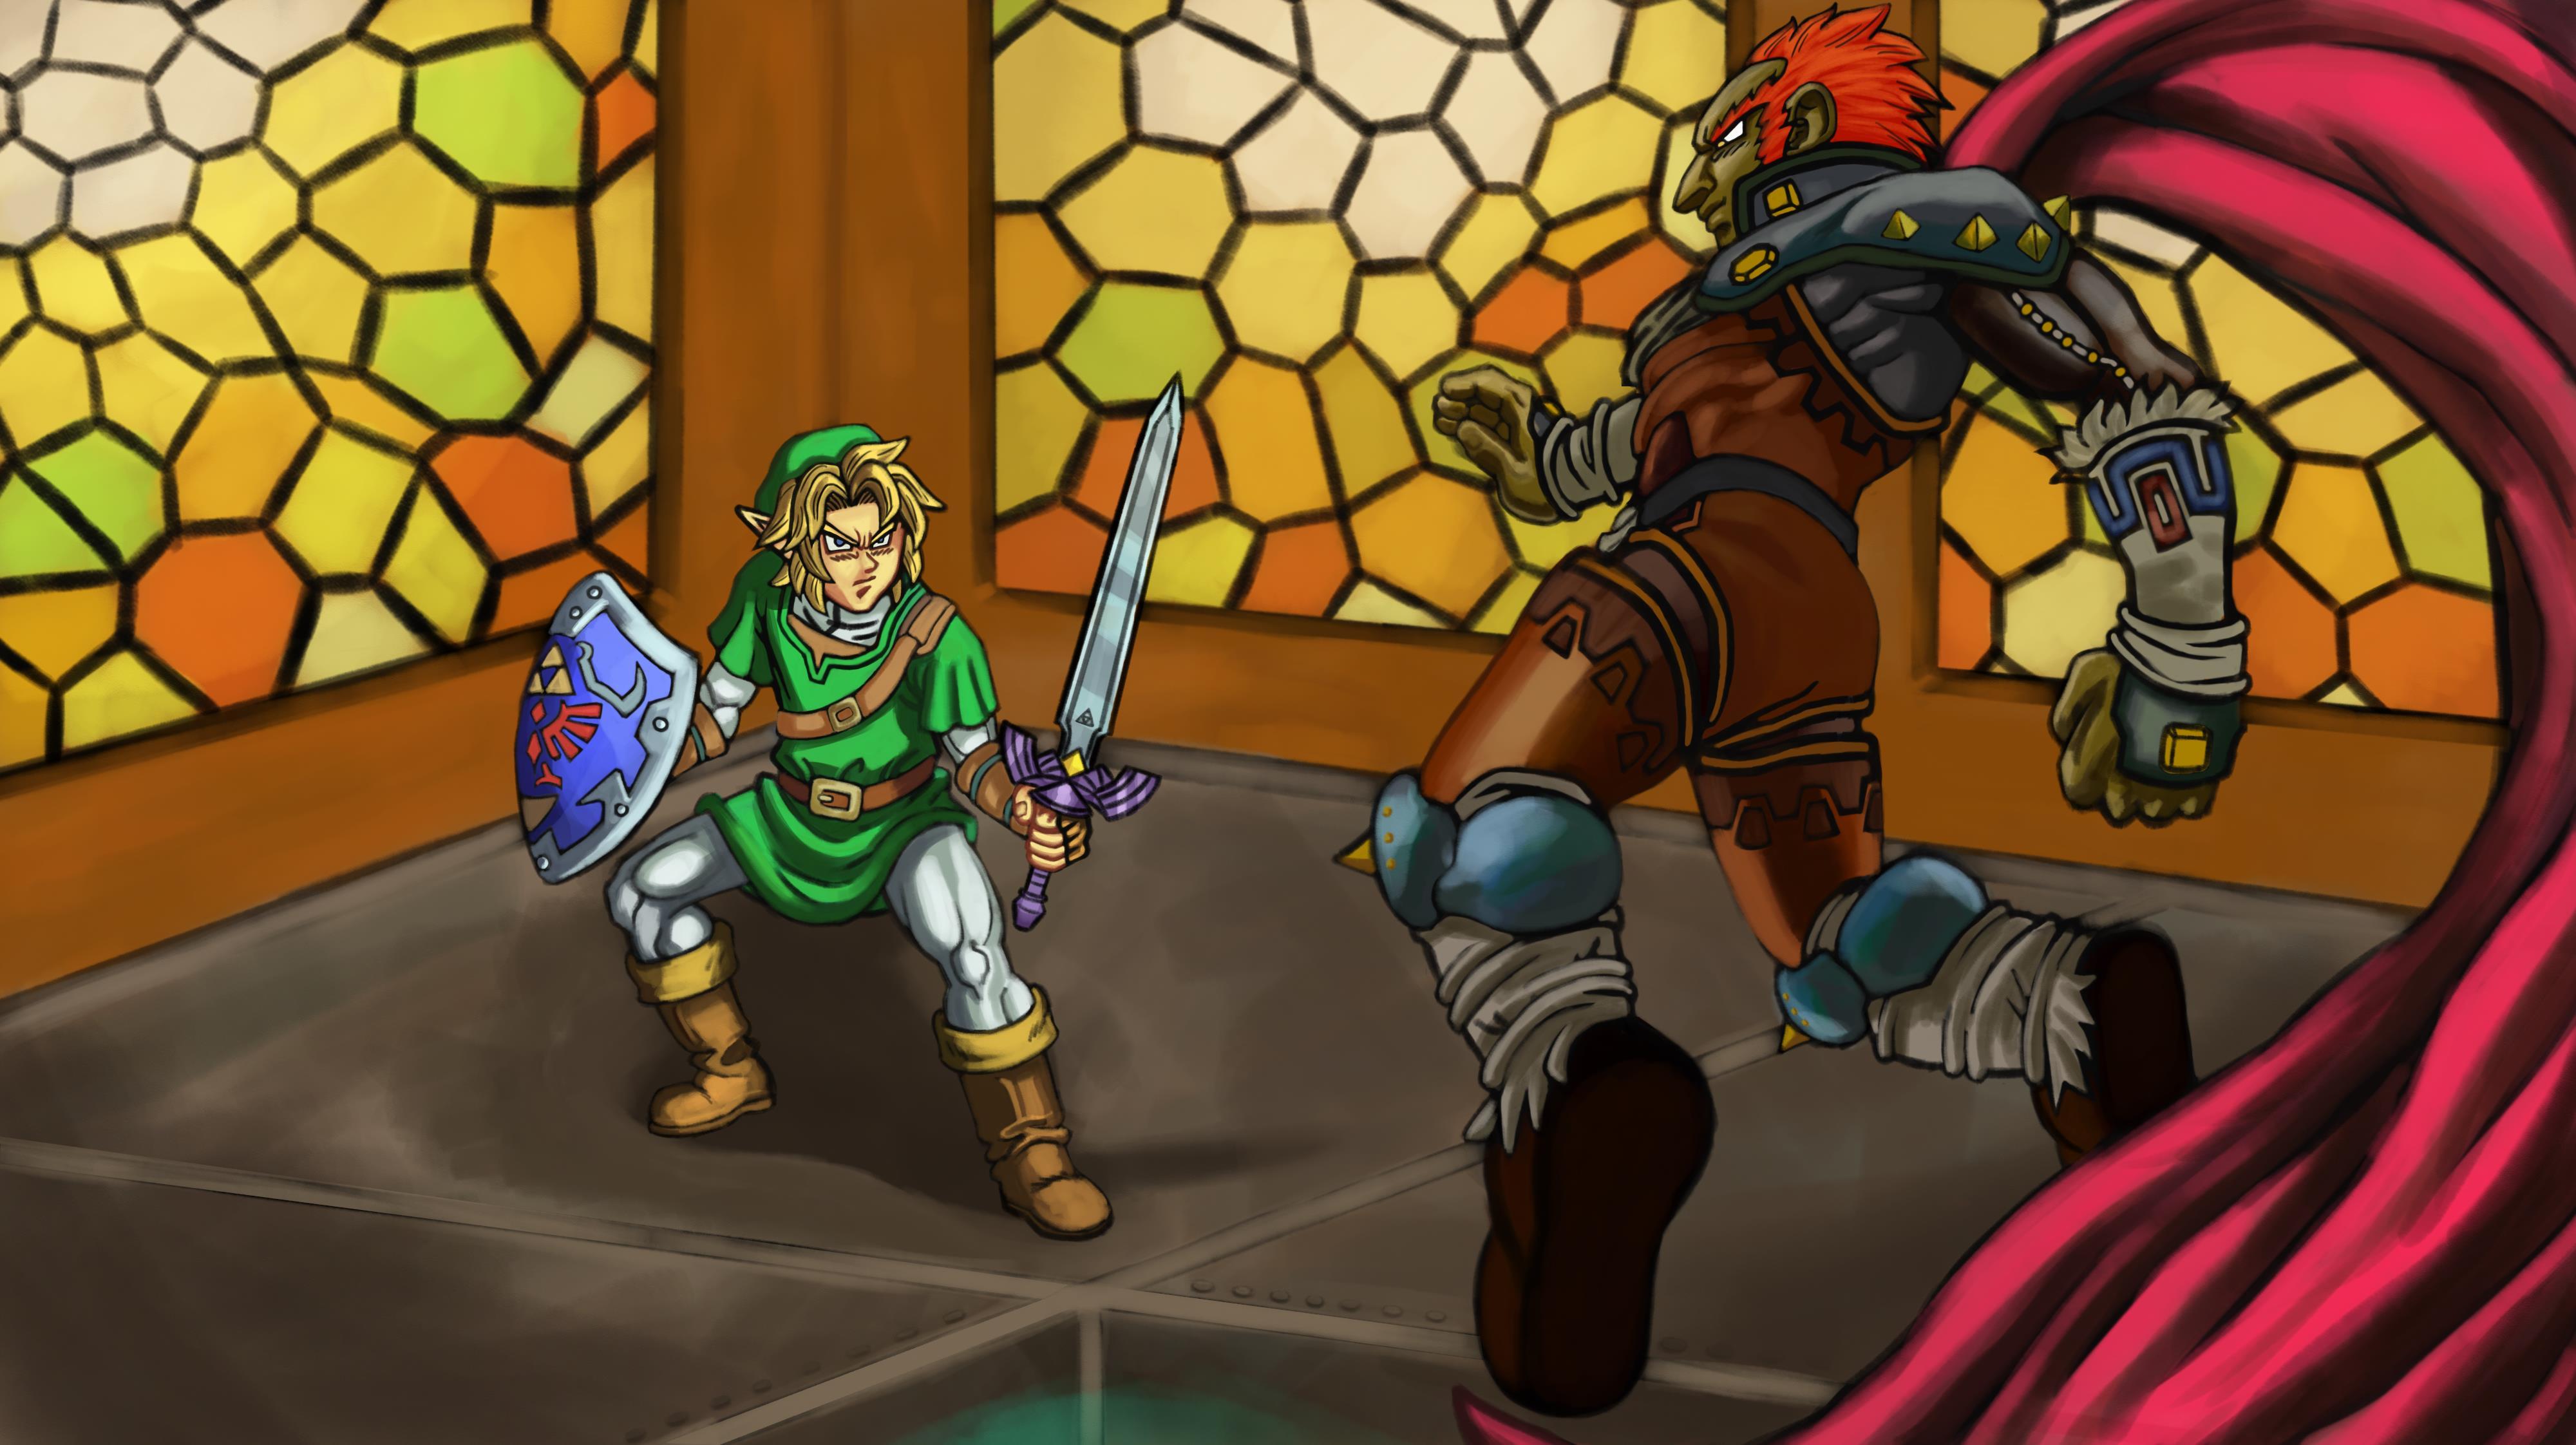 Legend of Zelda Toriyama style